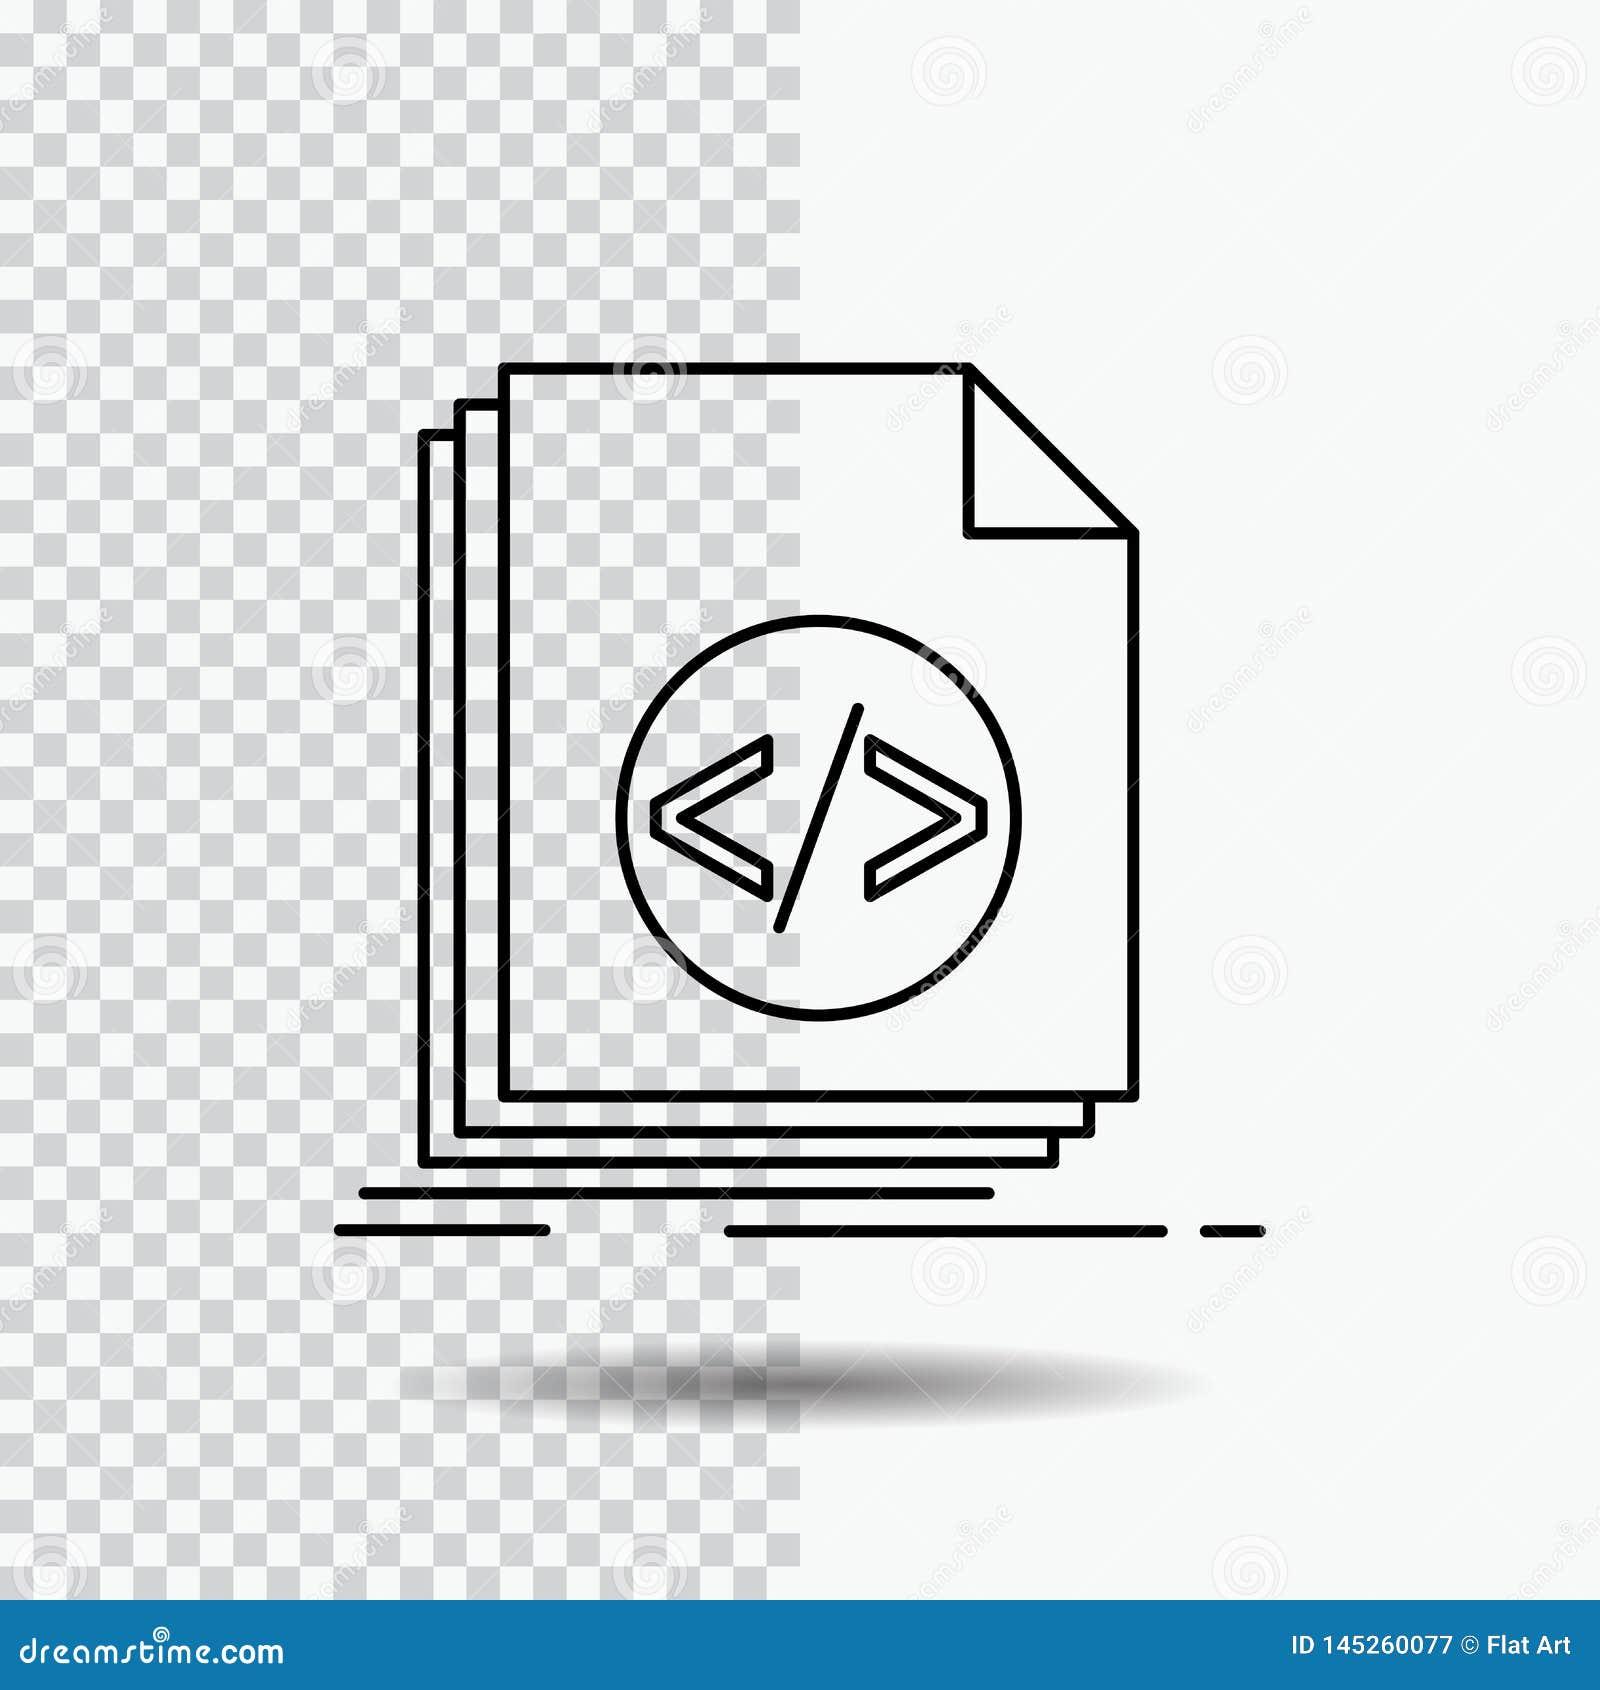 Code, coding, file, programming, script Line Icon on Transparent Background. Black Icon Vector Illustration